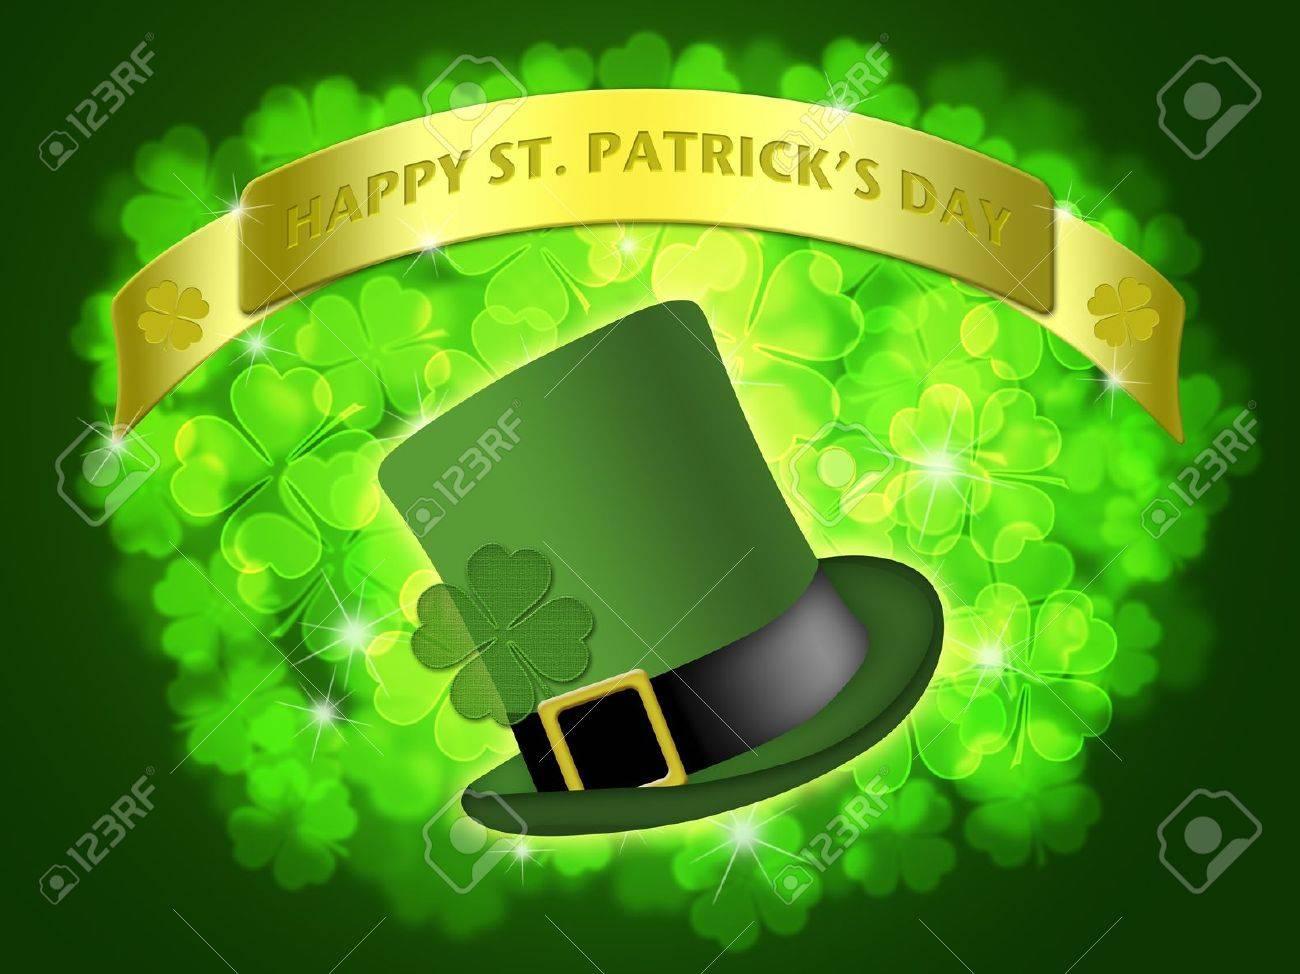 St Patricks Day Leprechaun Hat Banner with Shamrocks Bokeh Illustration Stock Photo - 8860968